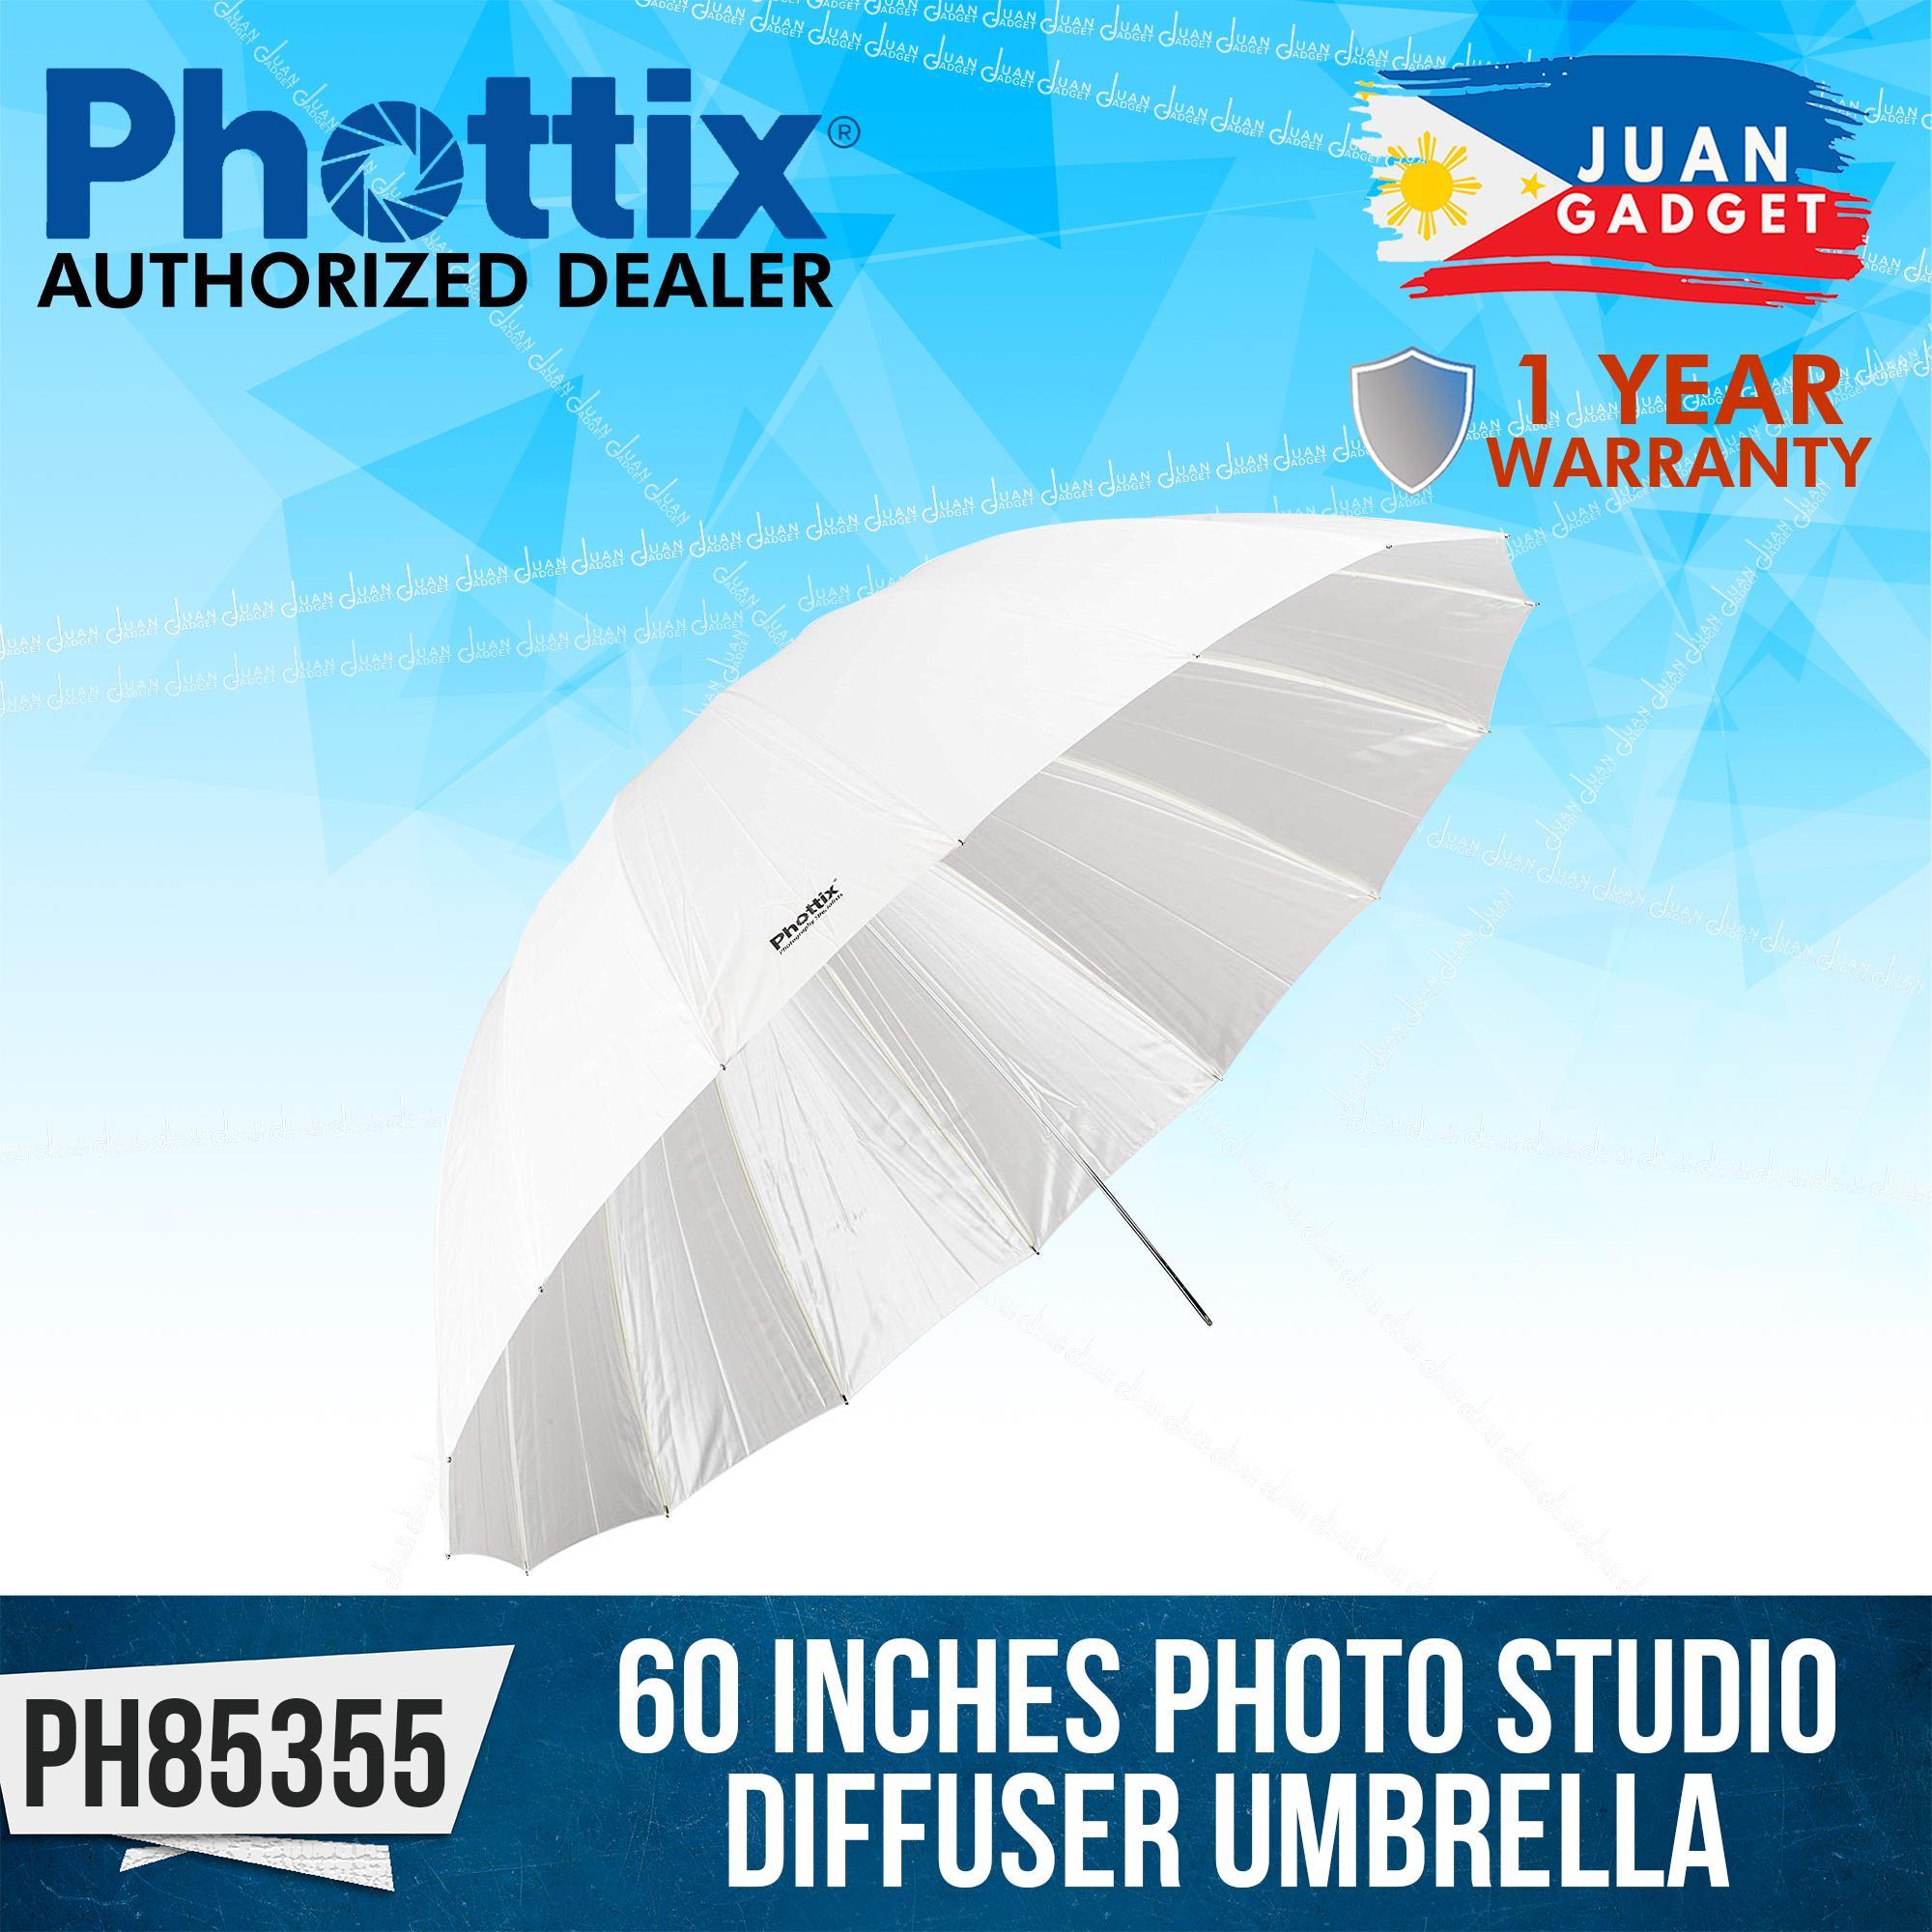 White Phottix 152 cm Photo Studio Diffuser Umbrella